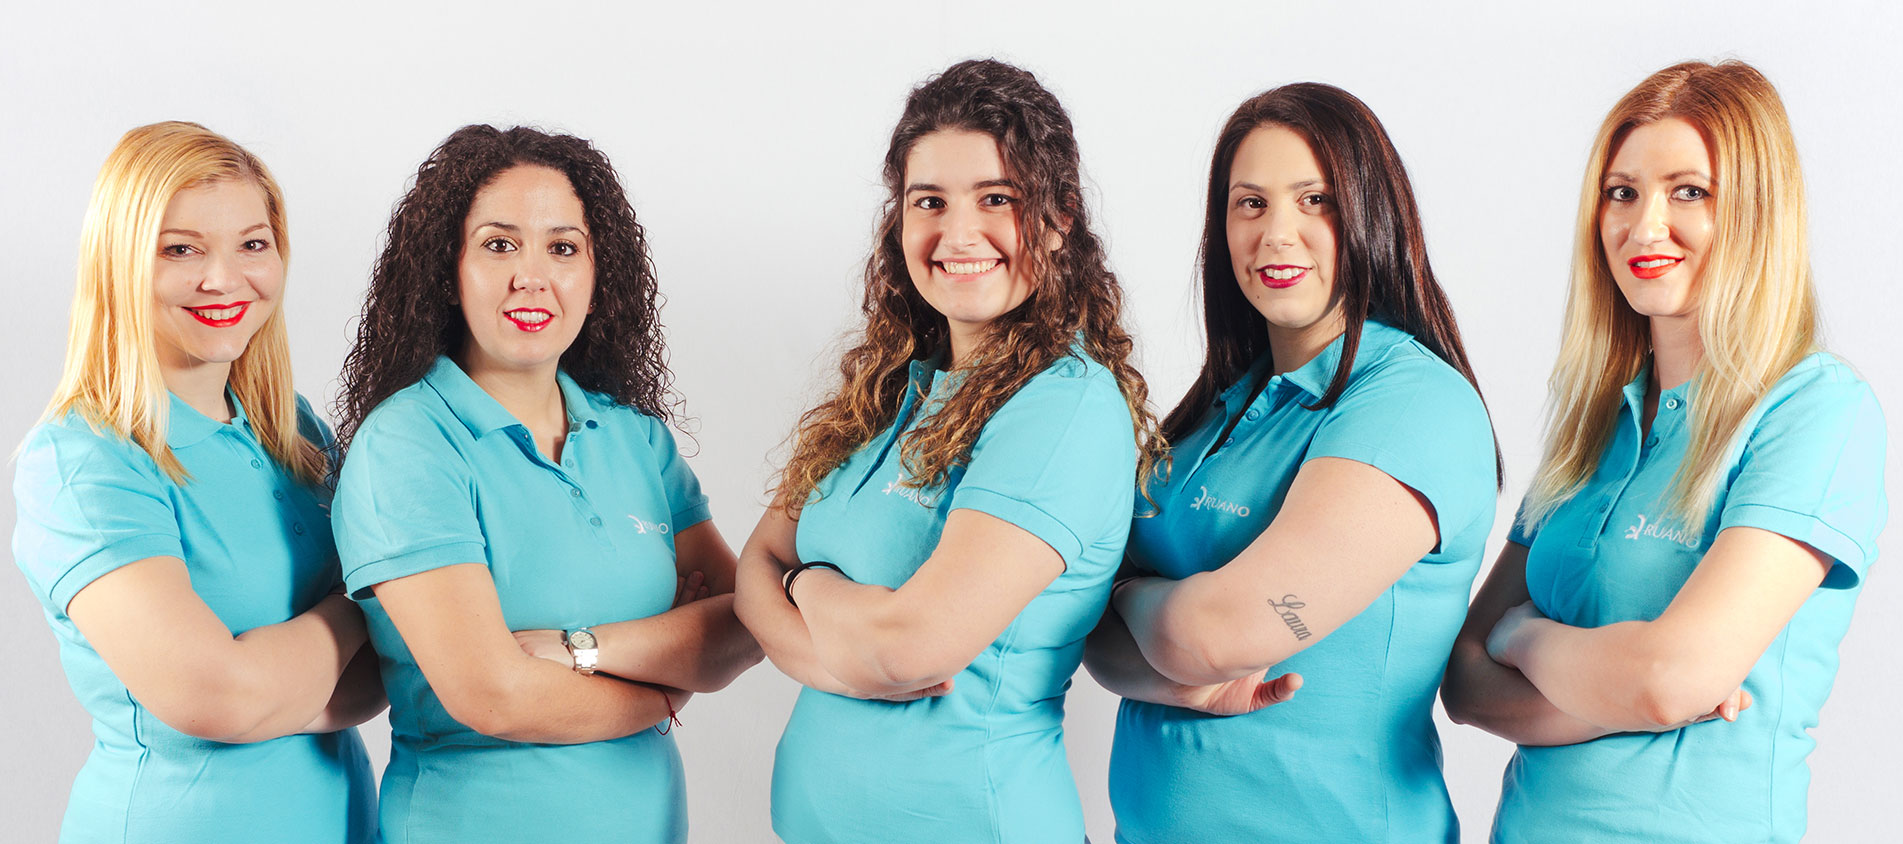 Equipo de auxiliares - Ruano Policlínica Dental